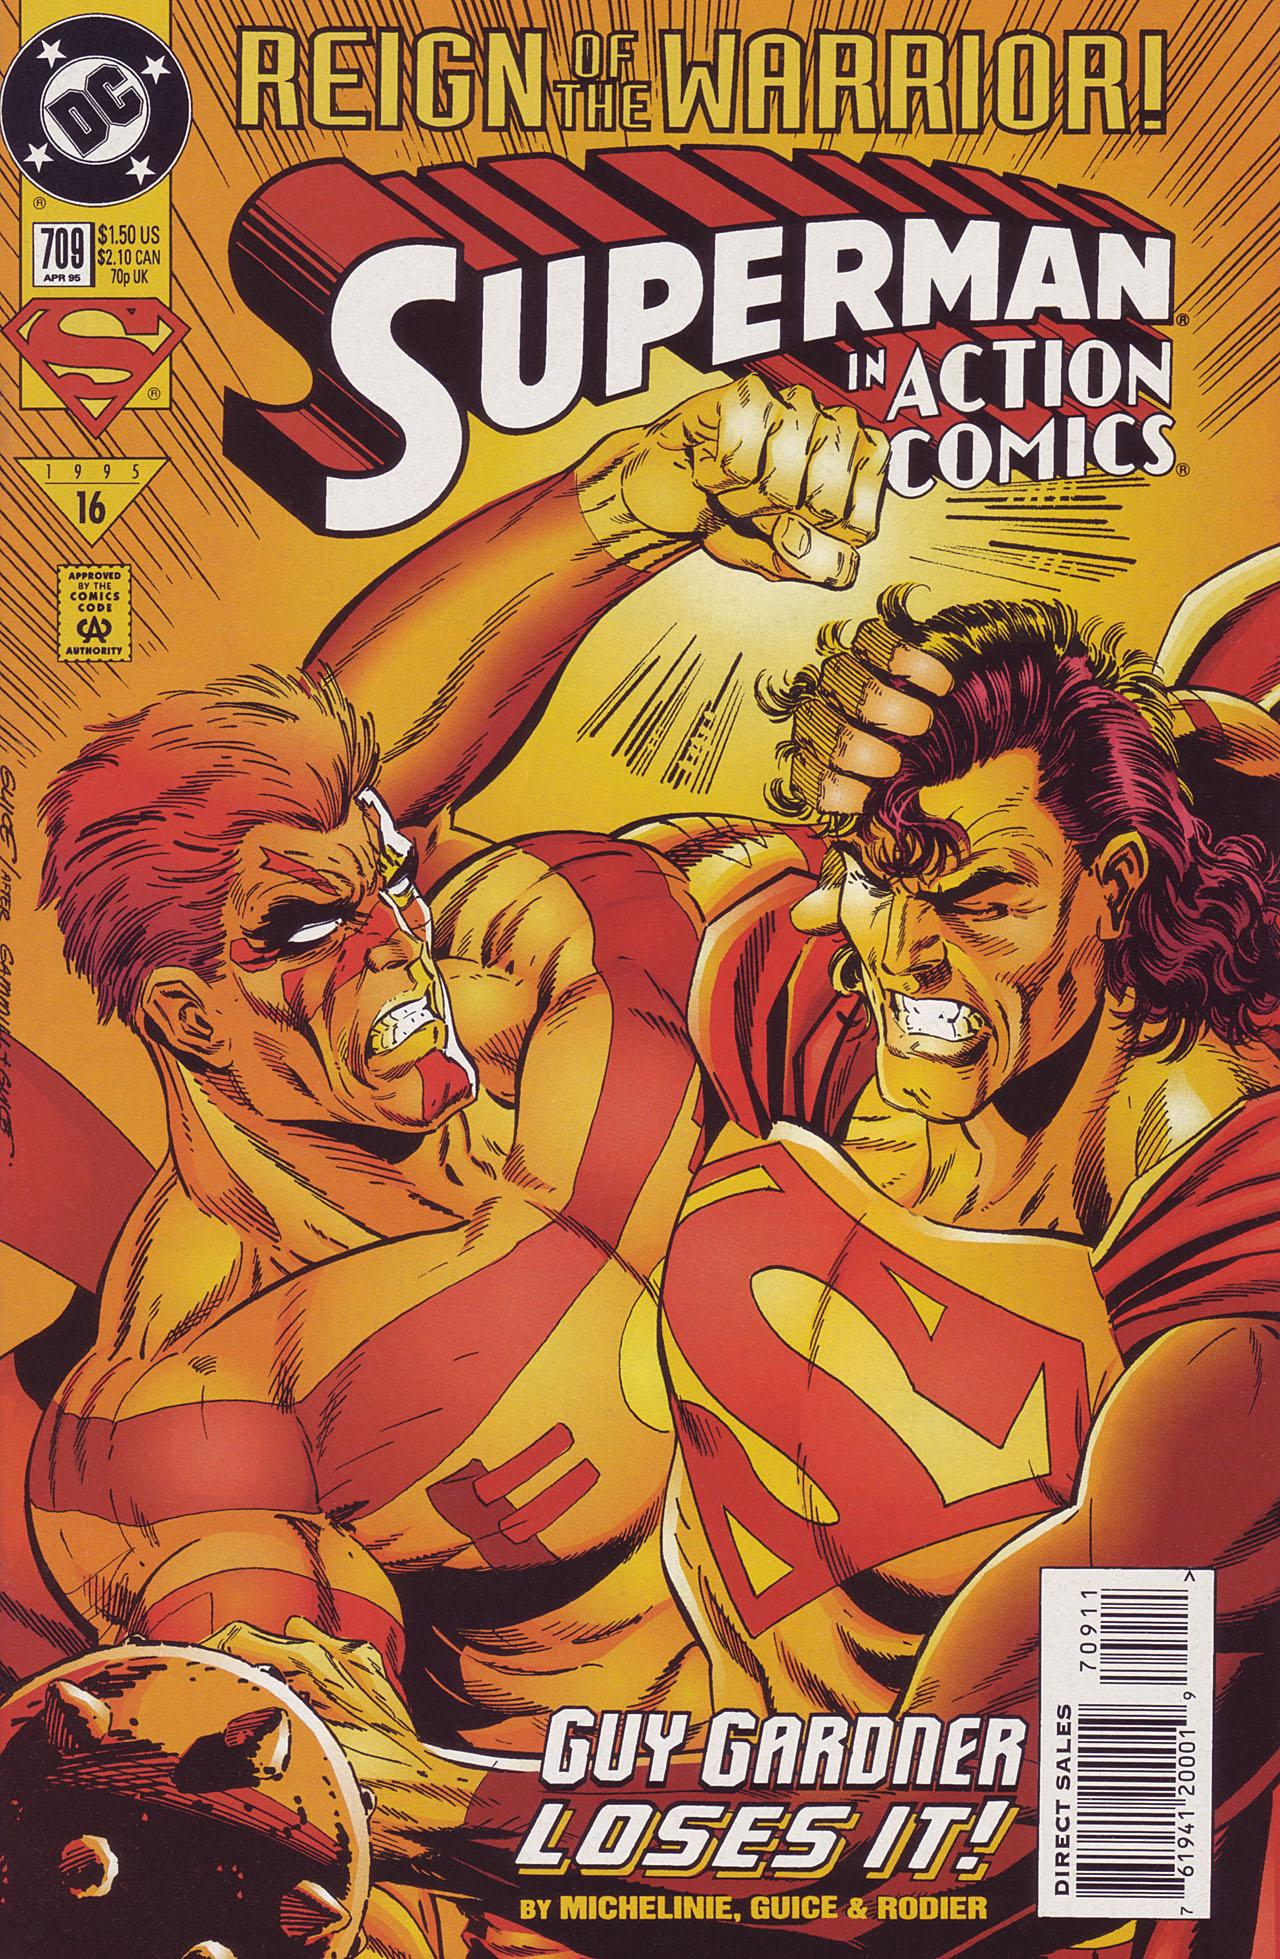 Action Comics (1938) 709 Page 1